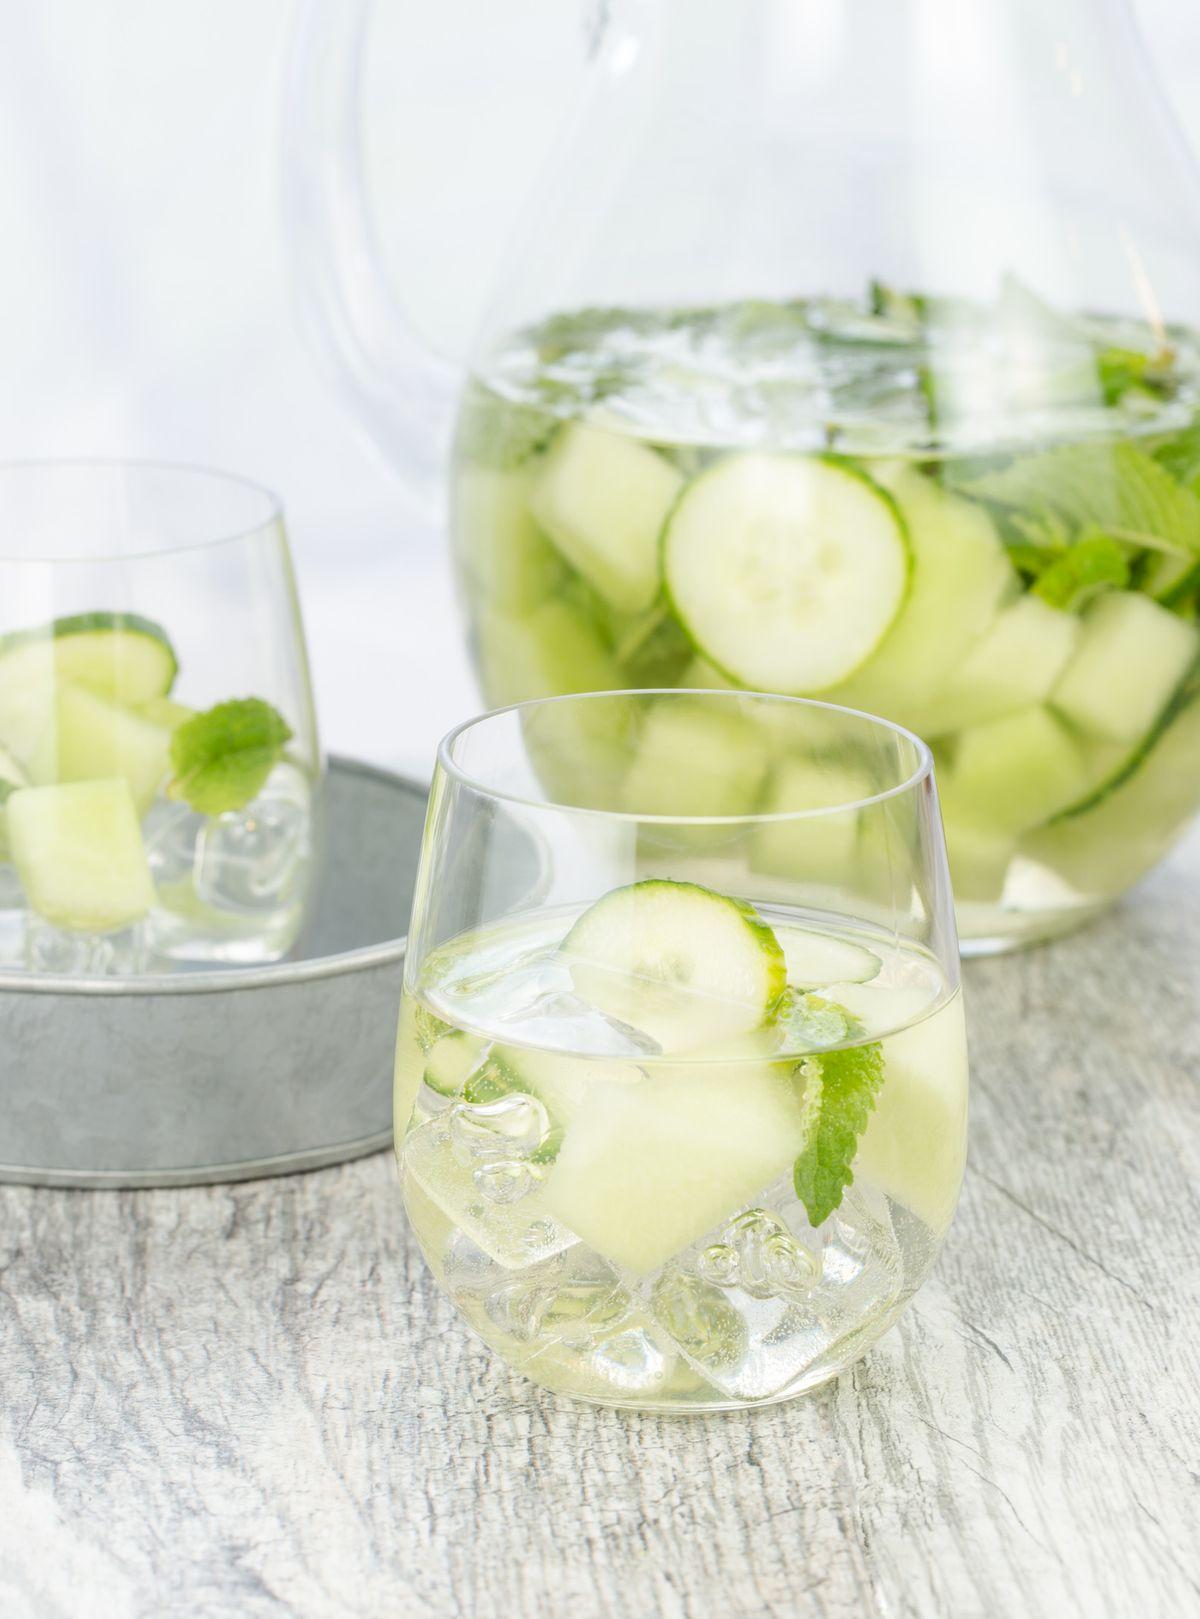 Cucumber-Melon-Sangria-1-of-2.jpg